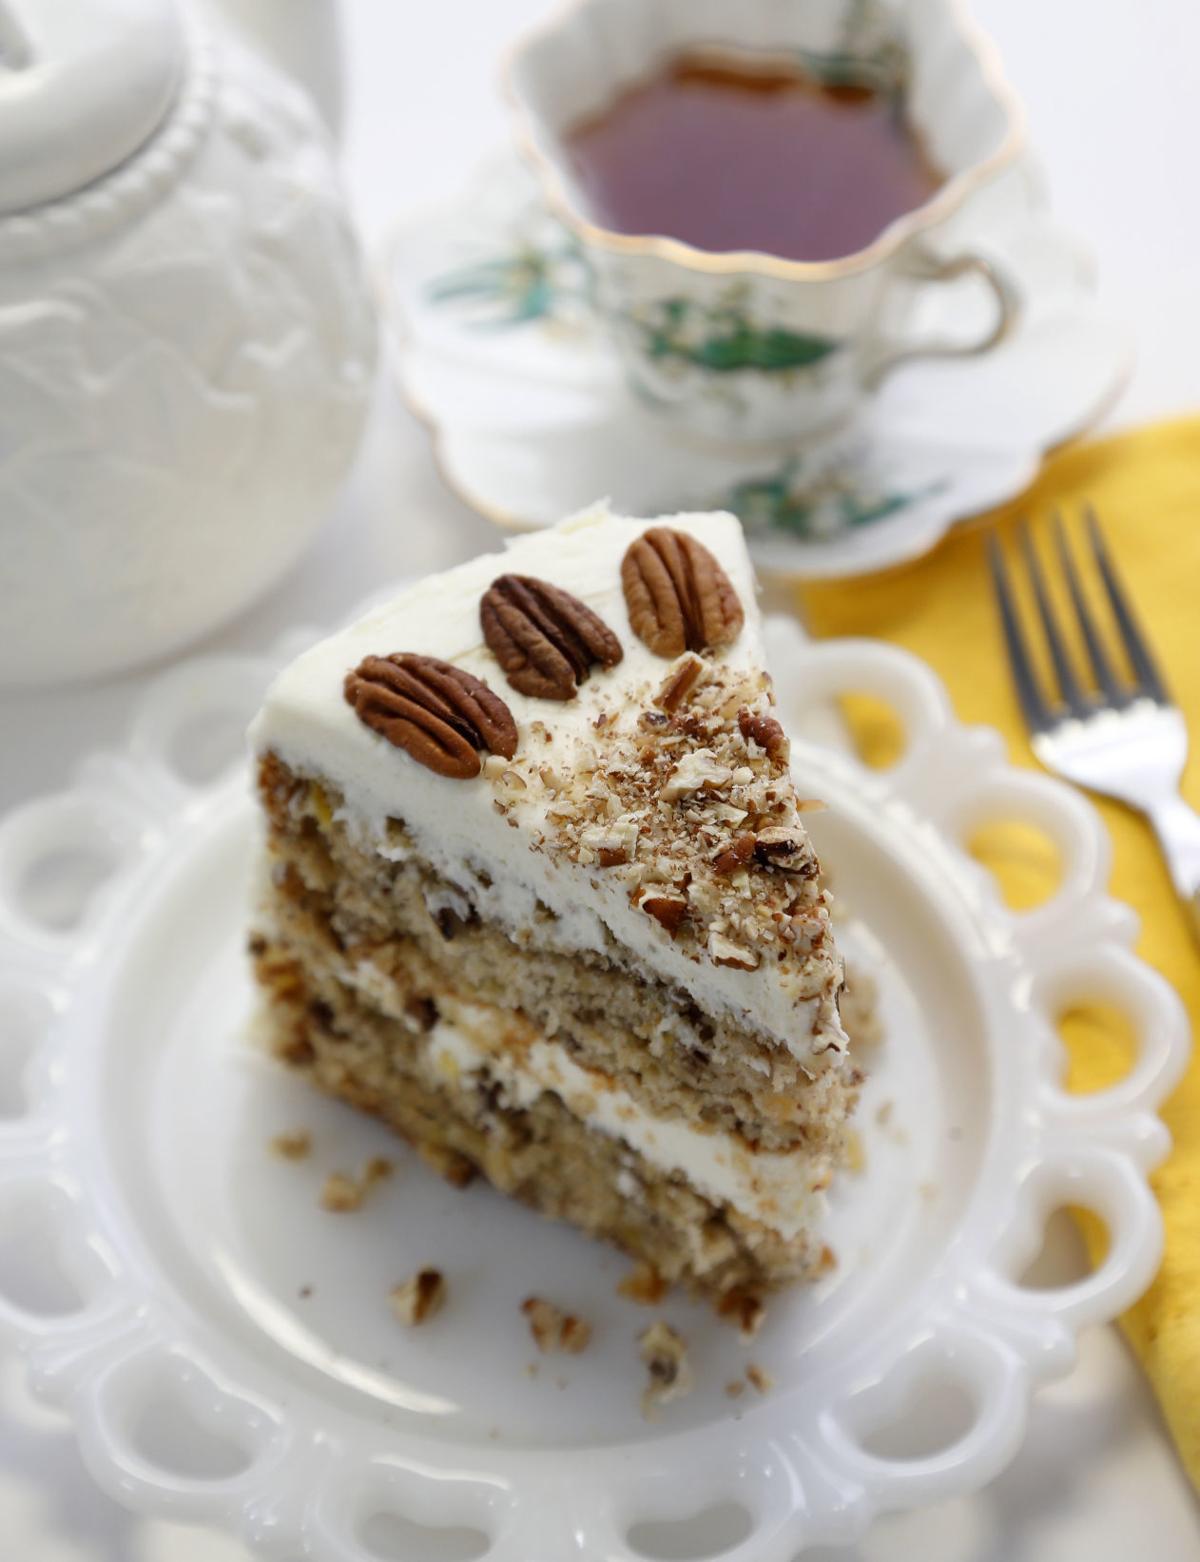 010518bp-cvhg-hummingbird-cake-04